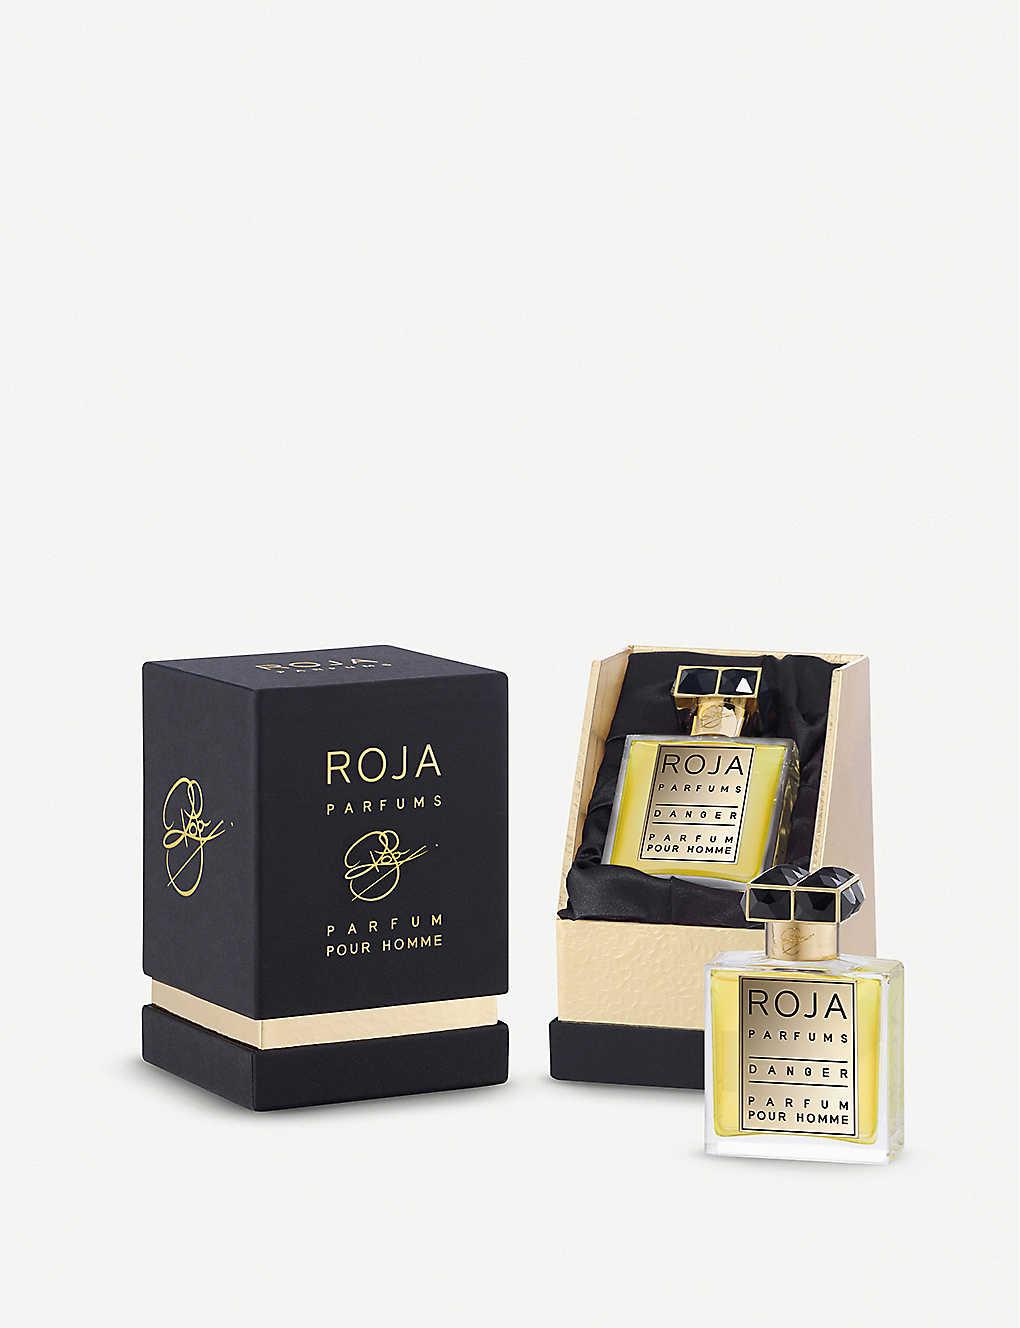 Homme Pour Parfums Parfum Roja Yf6gyvb7 Danger 50ml 0ynONwmvP8